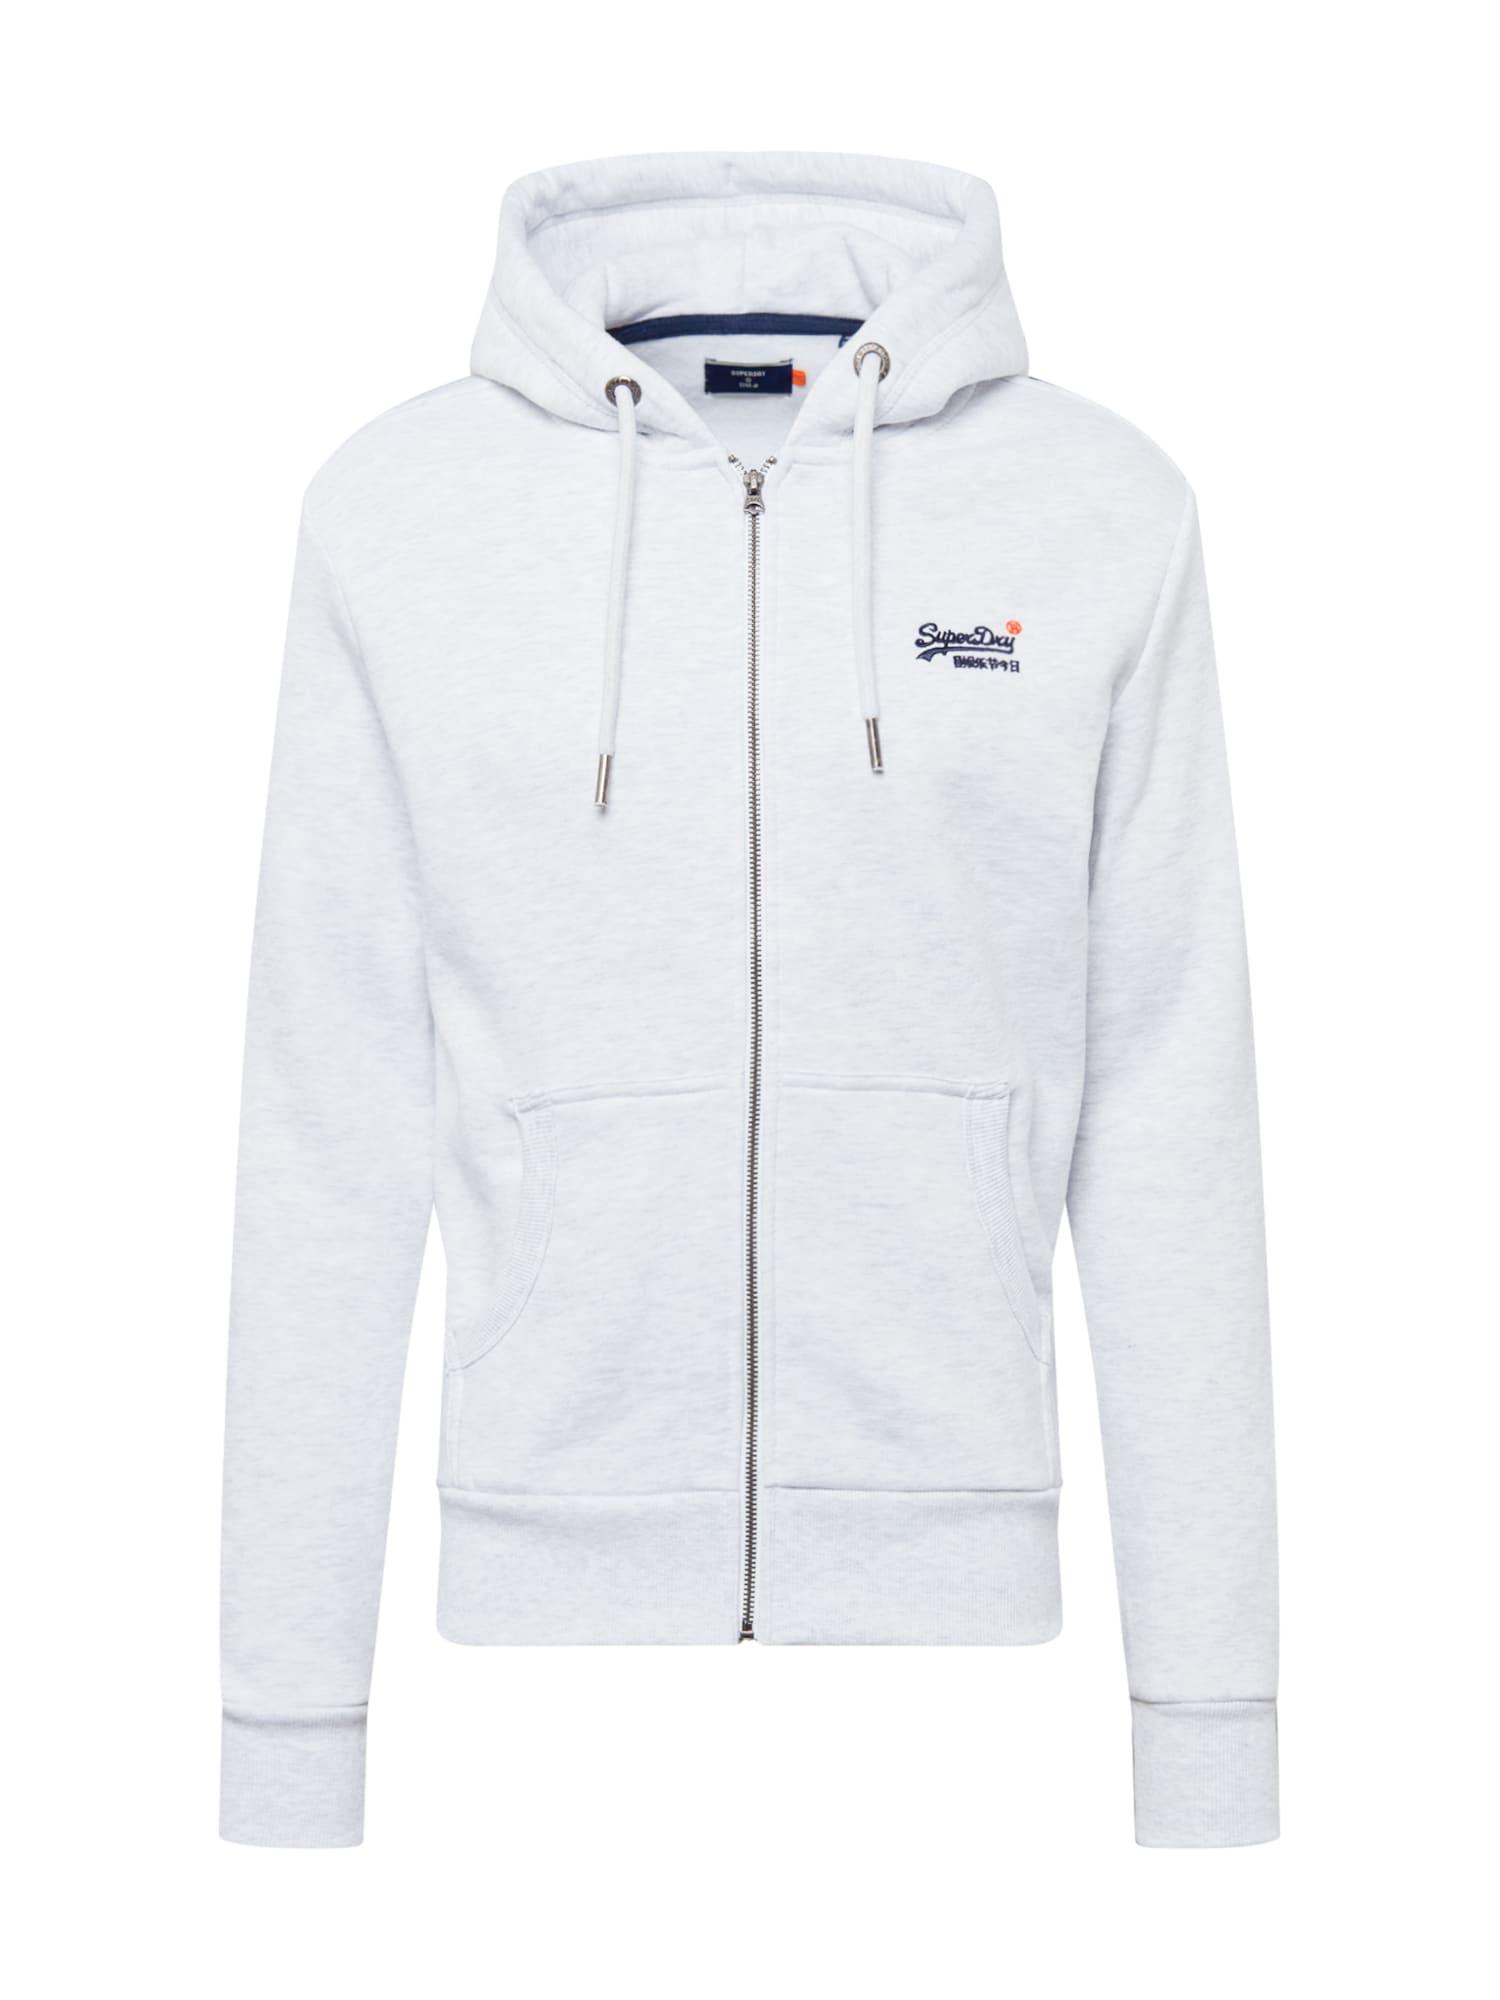 Superdry Mikina s kapucí  marine modrá / bílá